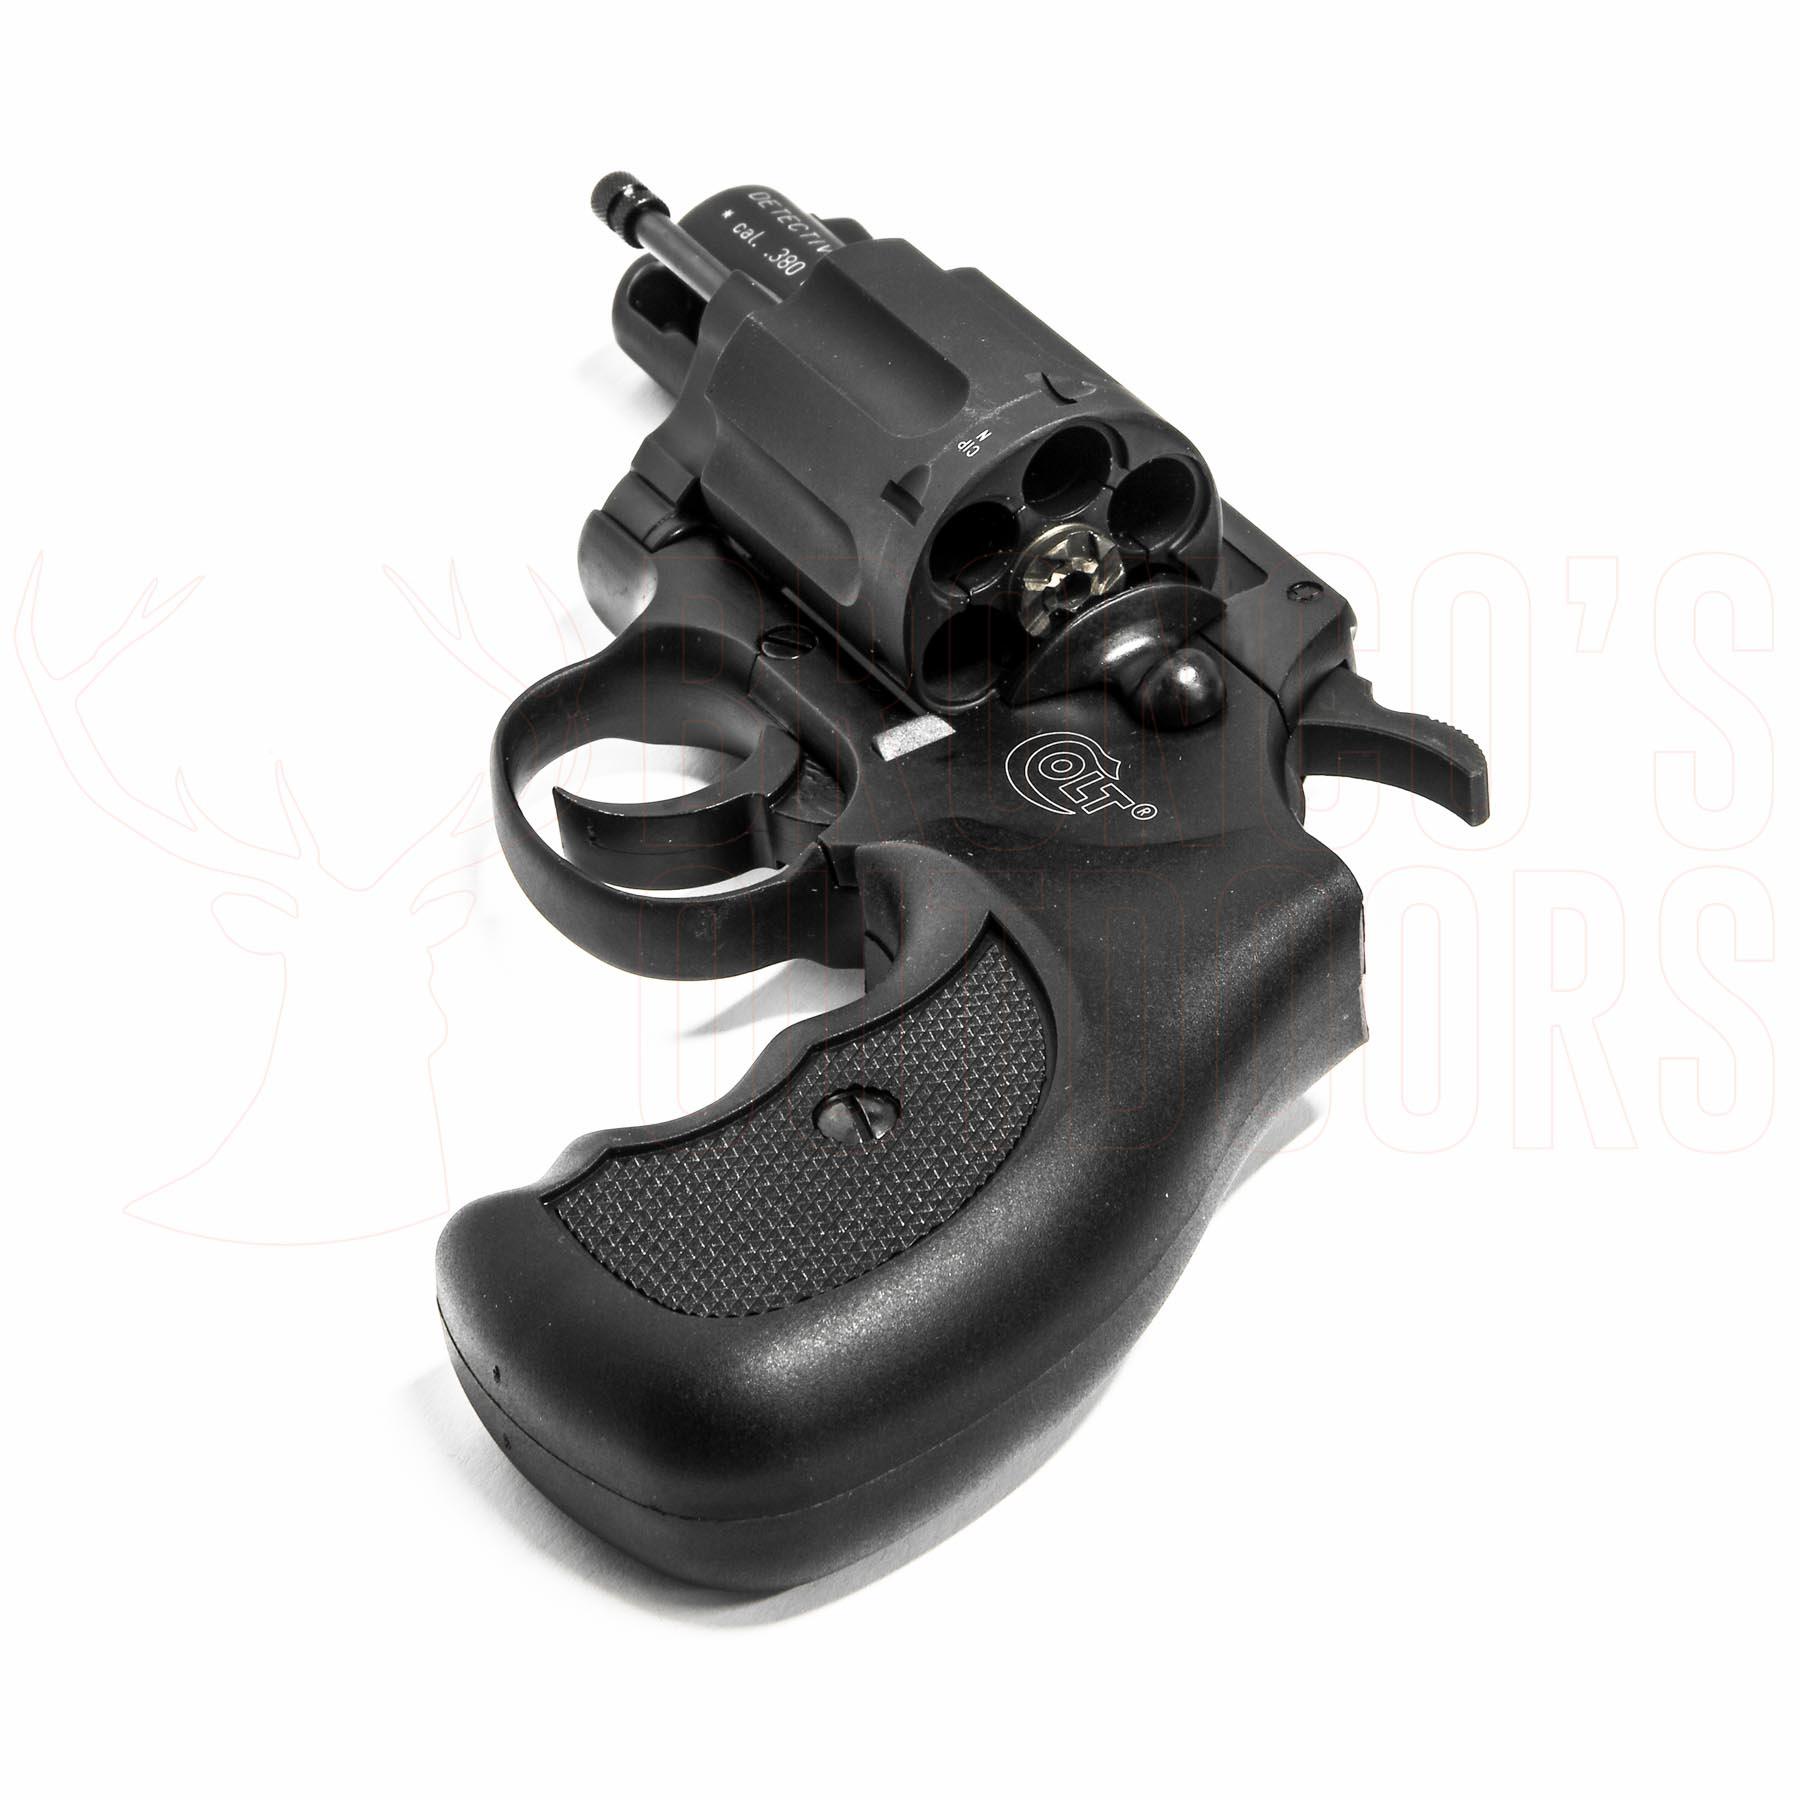 Umarex Colt Special Detective  380 Blank Revolver